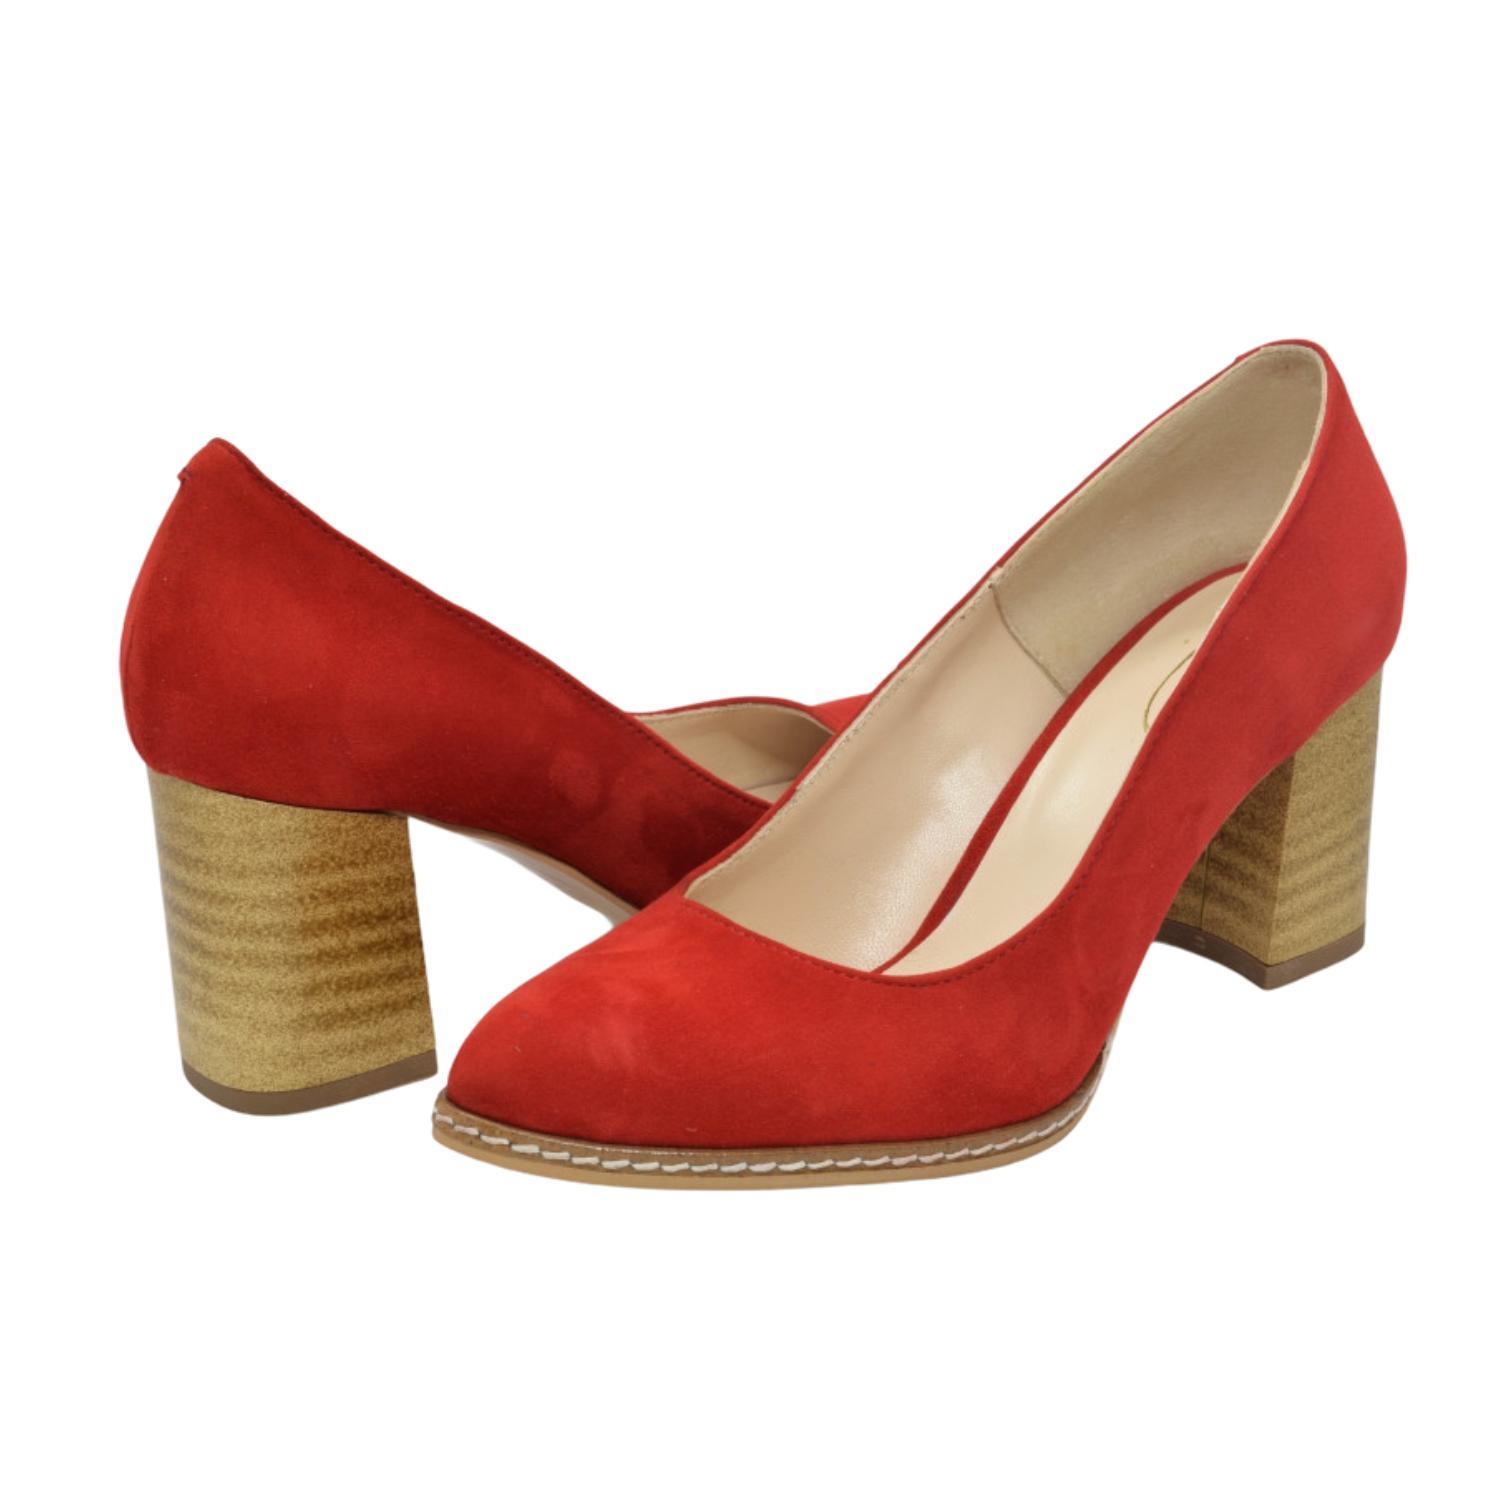 Pantofi rosii cu toc vintage